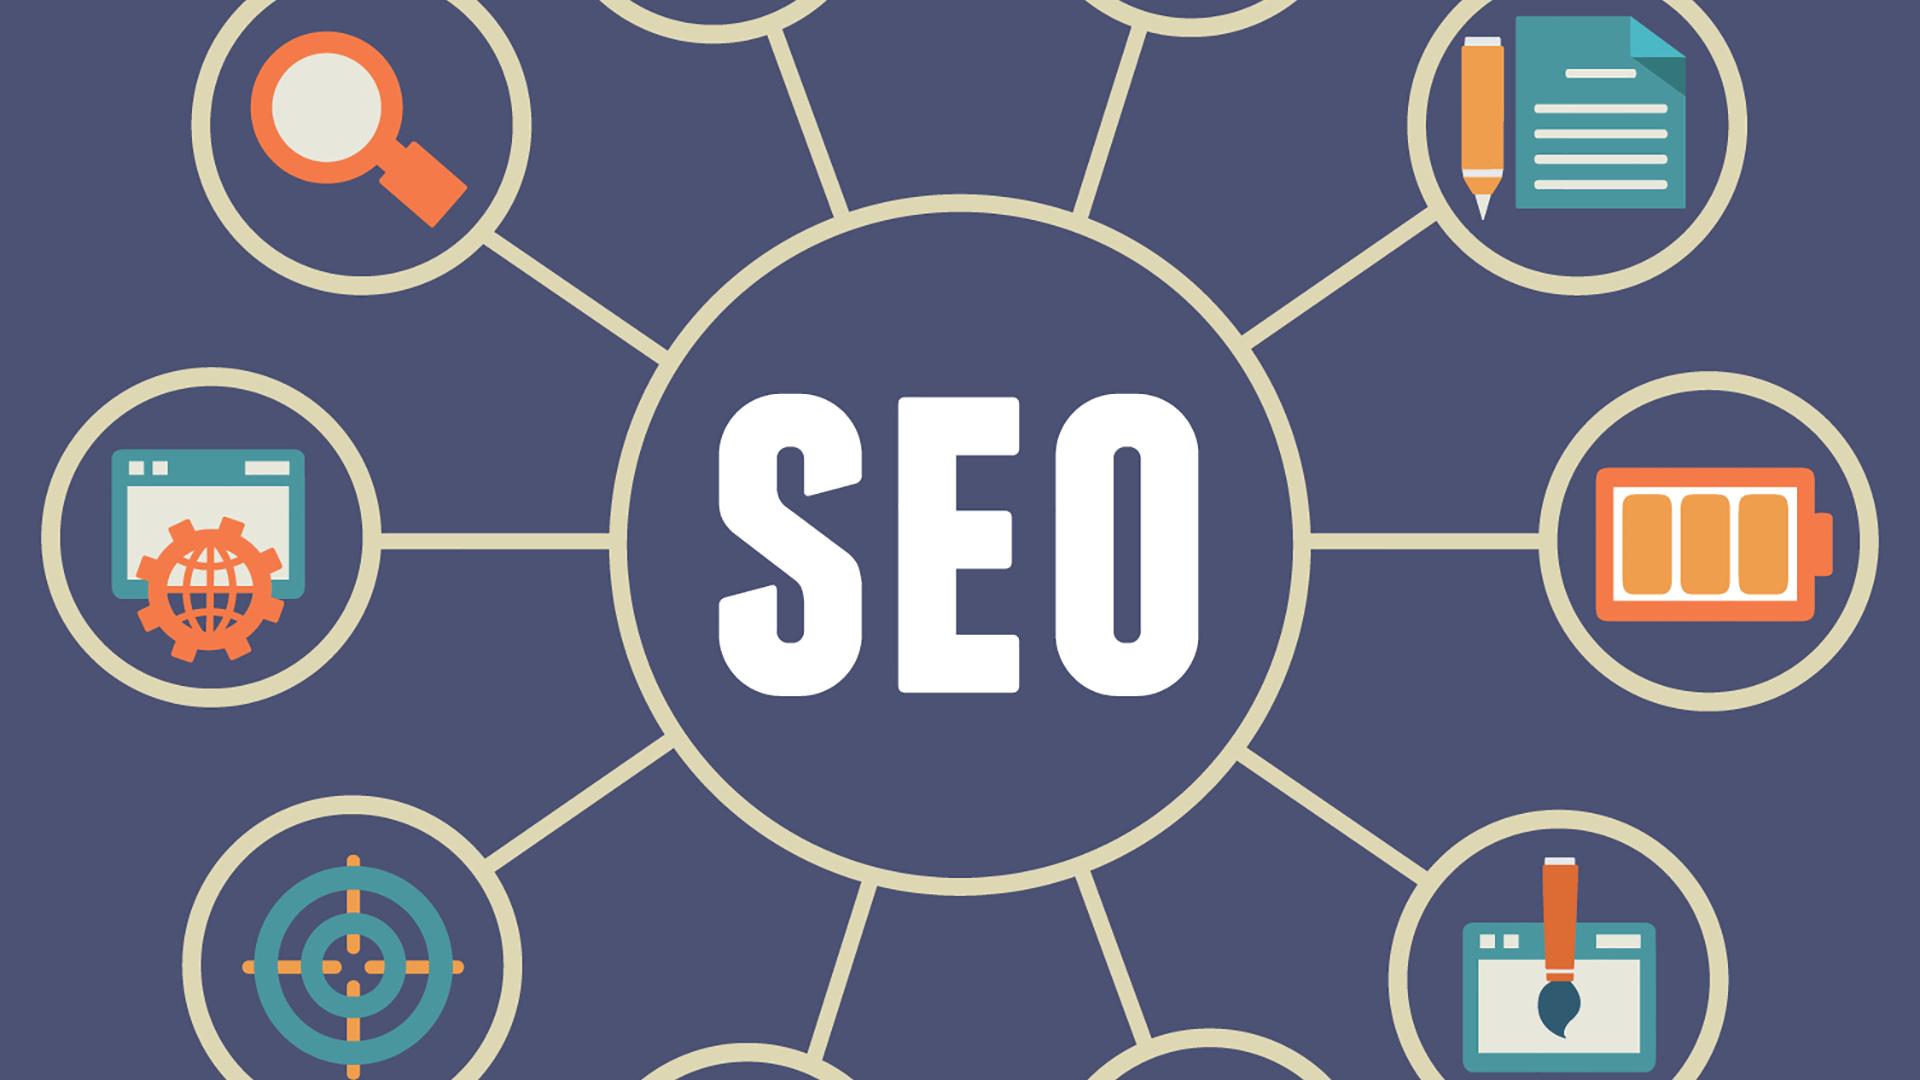 WordPress এর জন্যে বেস্ট Seo সেটিং। এবার আপনার সাইট উঠবে টপ-এ। (With SSHOT)